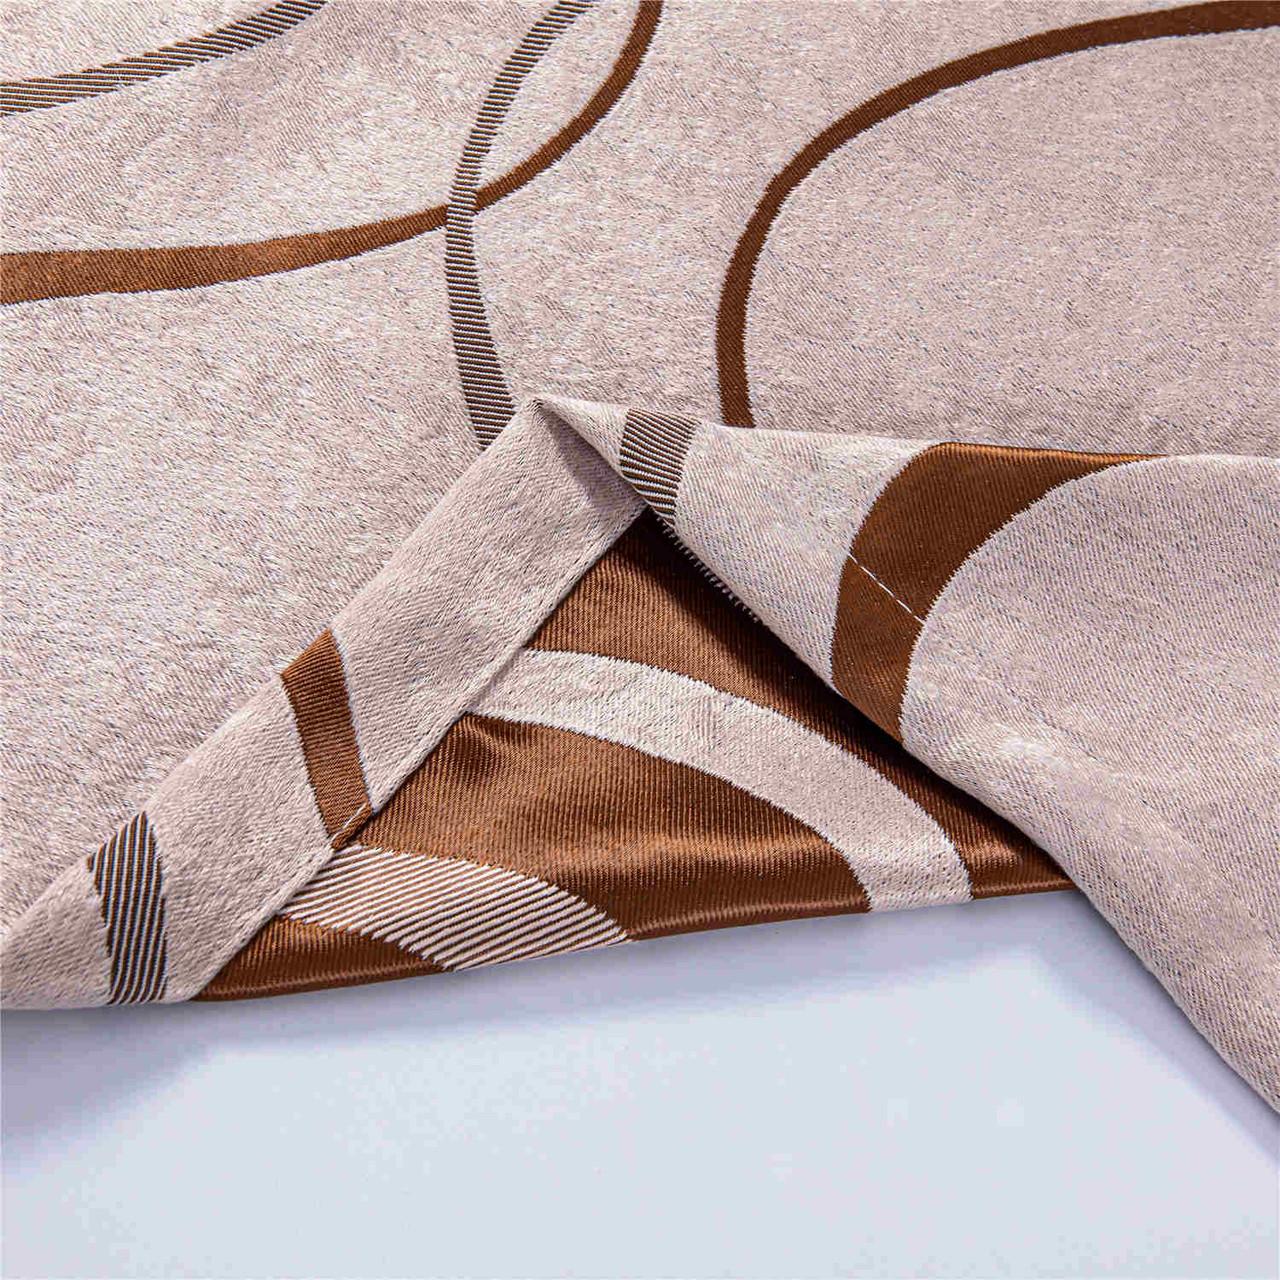 Curtain Panel Semi-Blackout Drapes, DMC497 Dolce Mela Warsaw Window Treatments